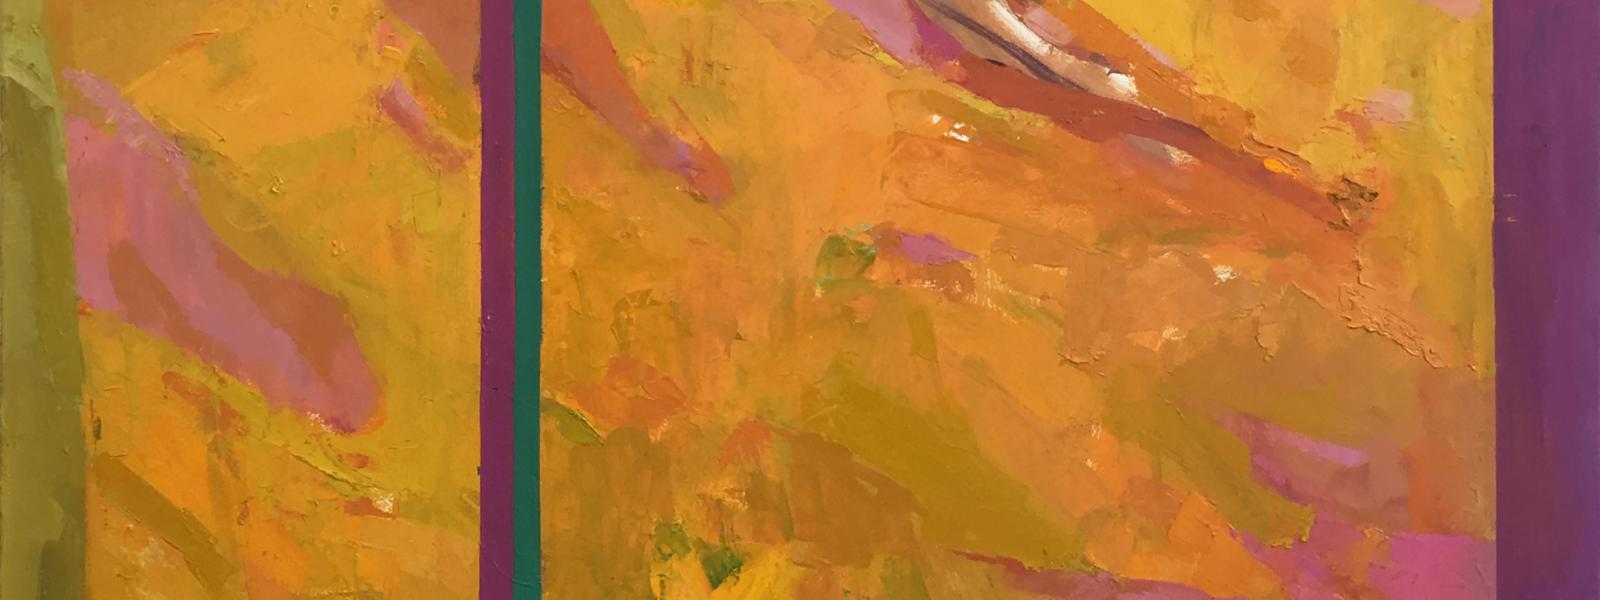 "Nicholas Anthony Mancini - Green Porch - Oil on Canvas 46""x40"" 2018"